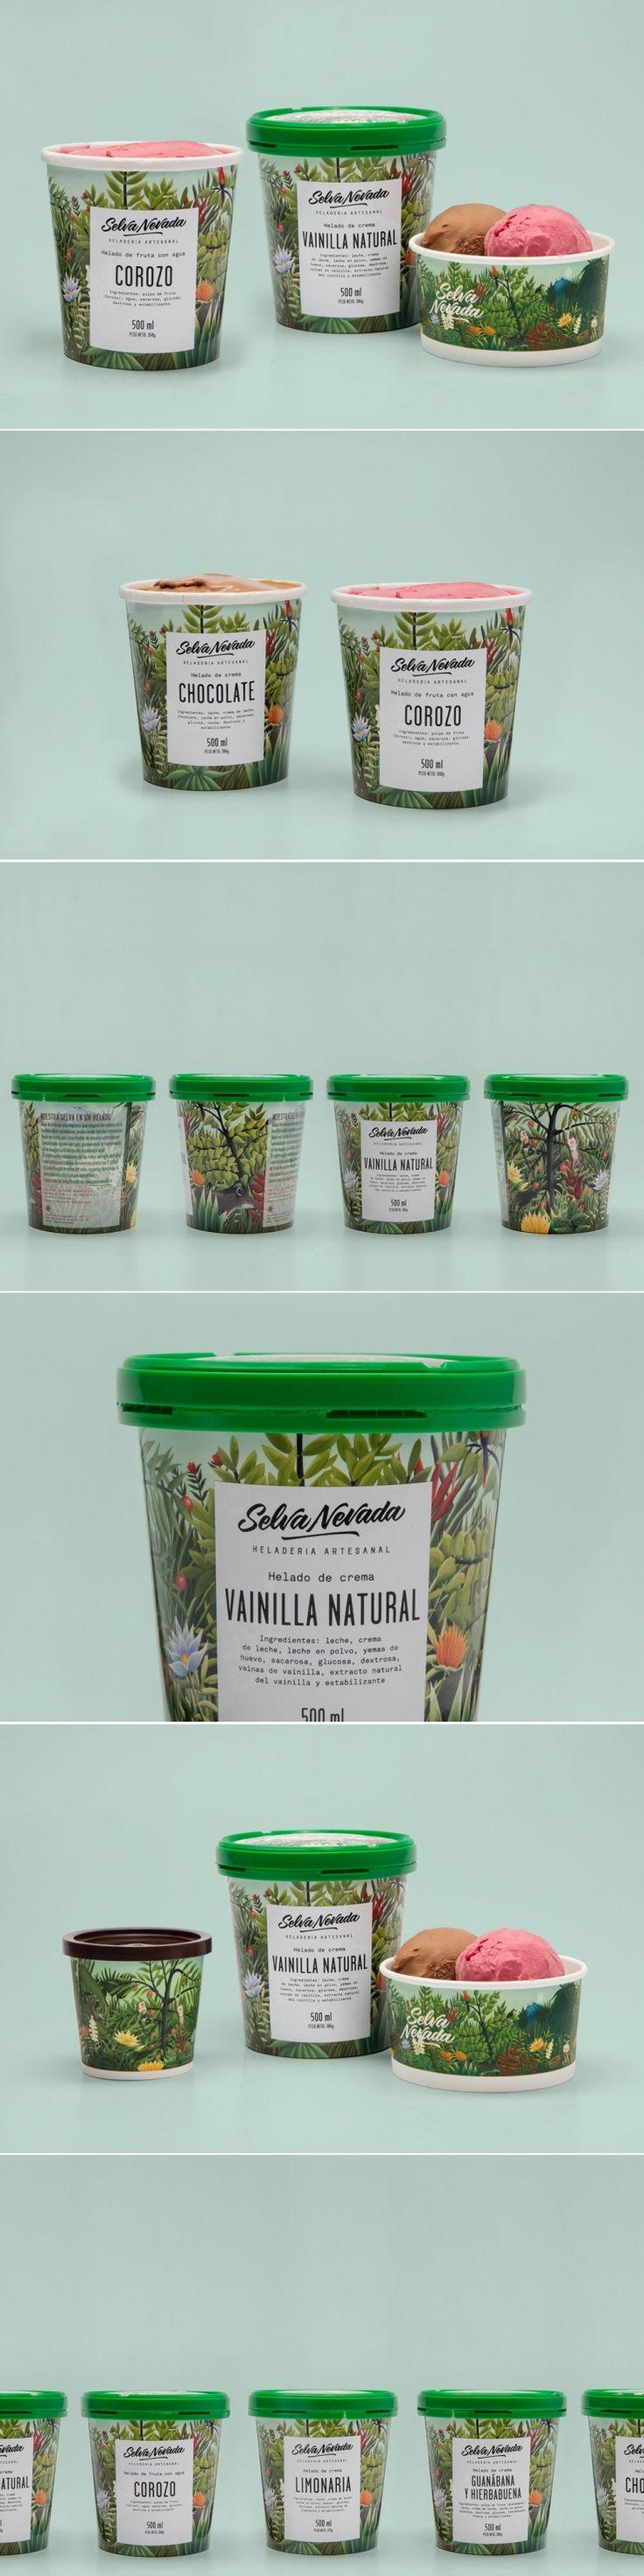 Nos encanta este helado botánico inspirado   – Layout & Graphic & Product